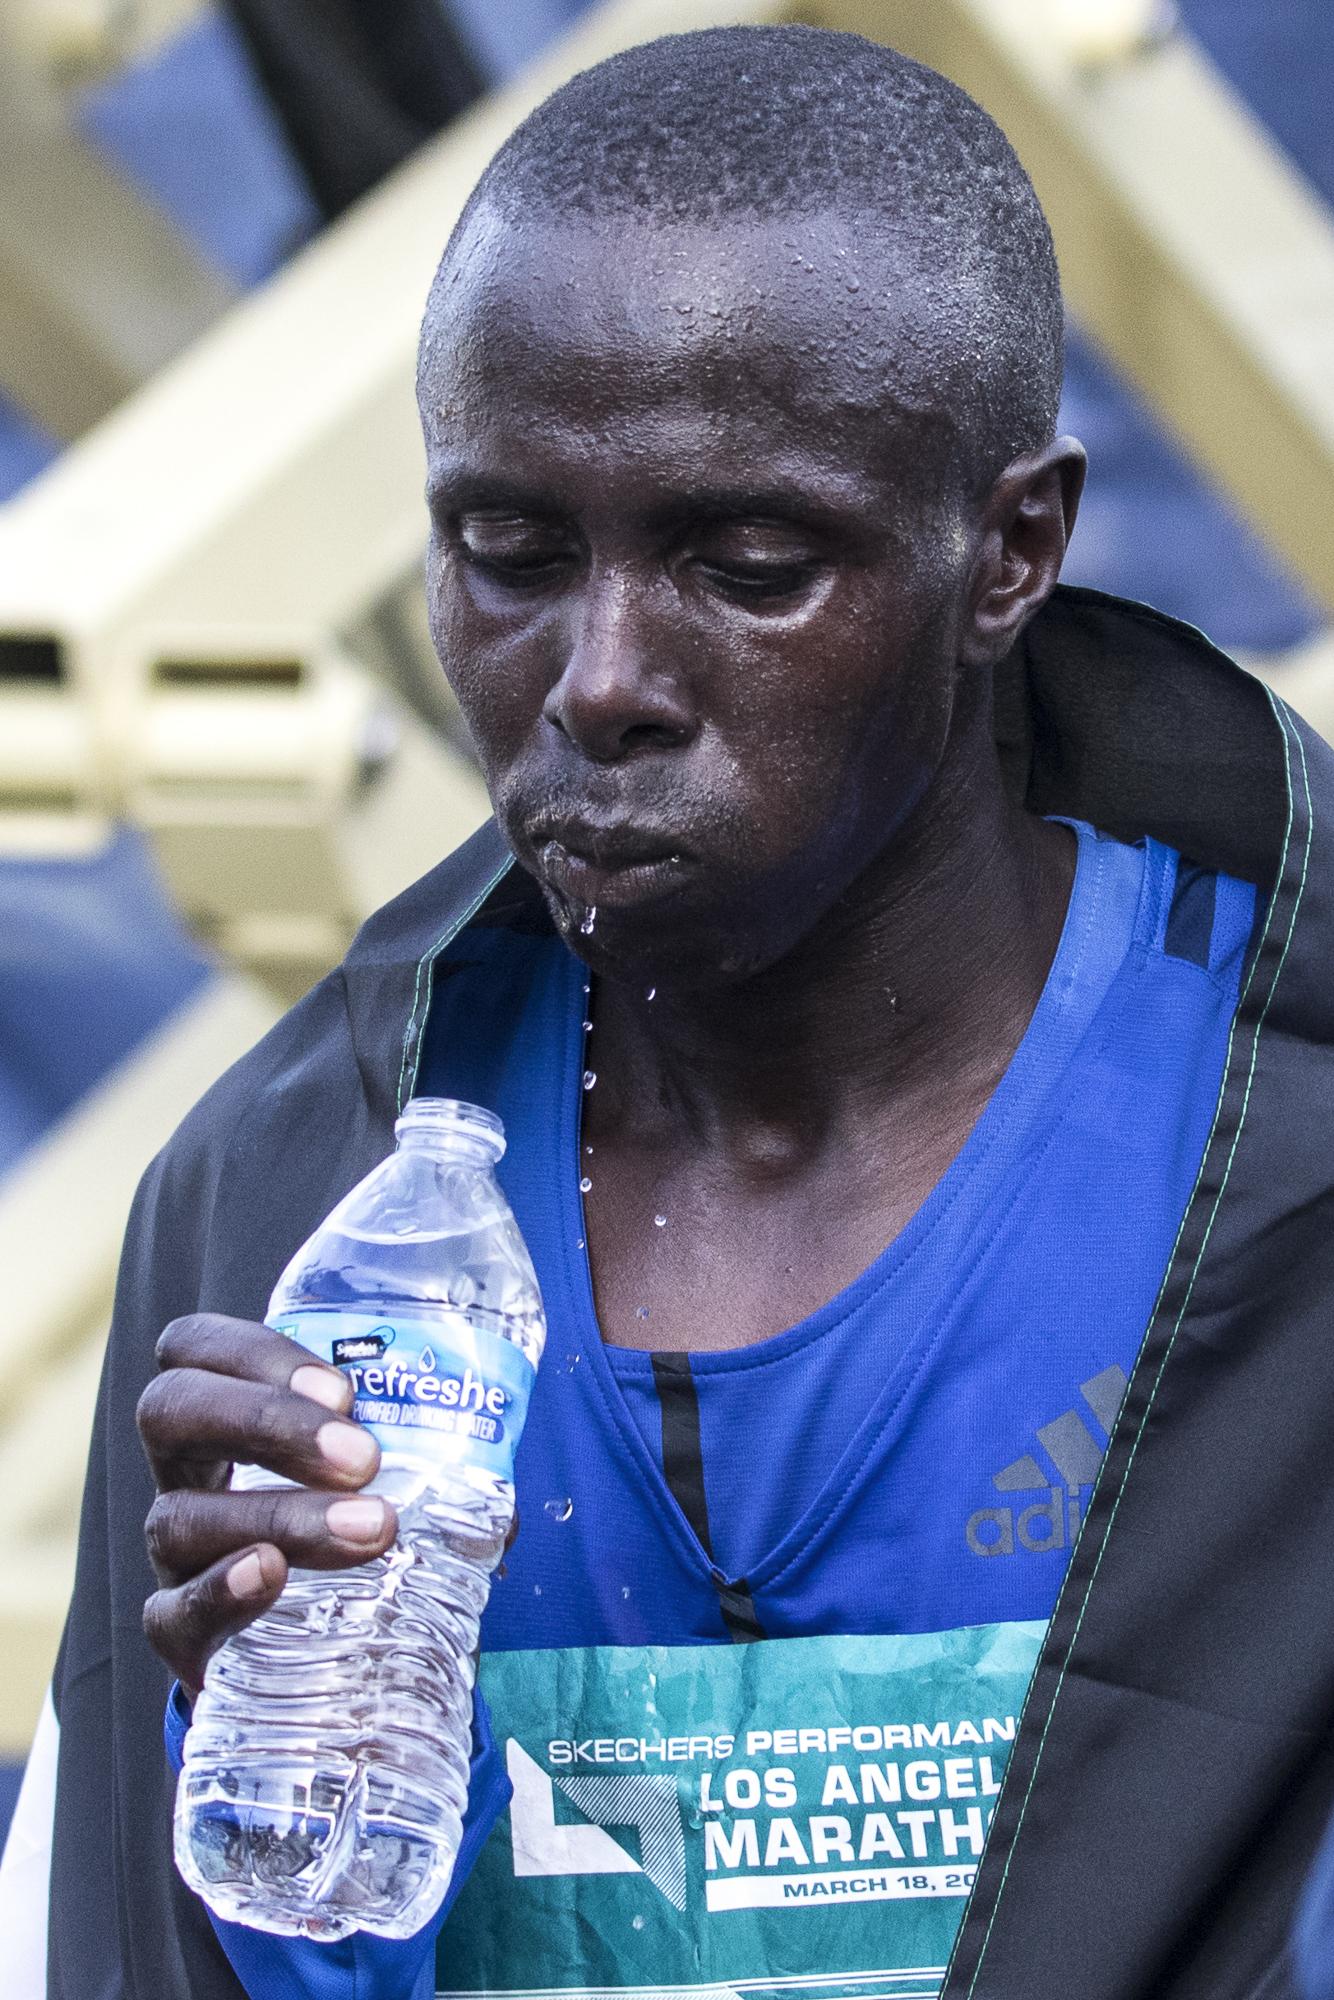 Elisha Barno gets a drink of water after finishing third in the 2018 Los Angeles Marathon on March 18, 2018 in Santa Monica, California. (Zane Meyer-Thornton/Corsair Photo)